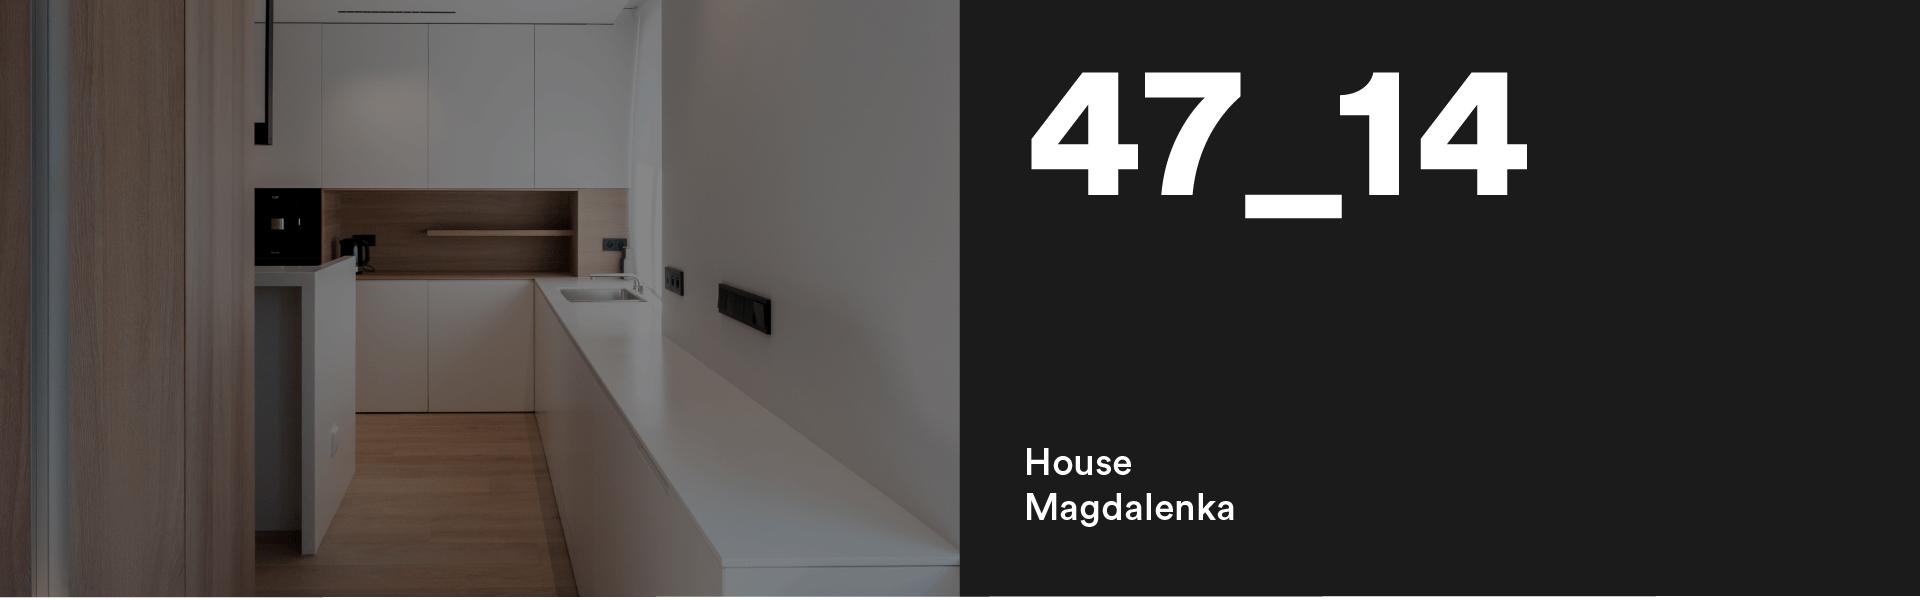 47_14 House Magdalenka